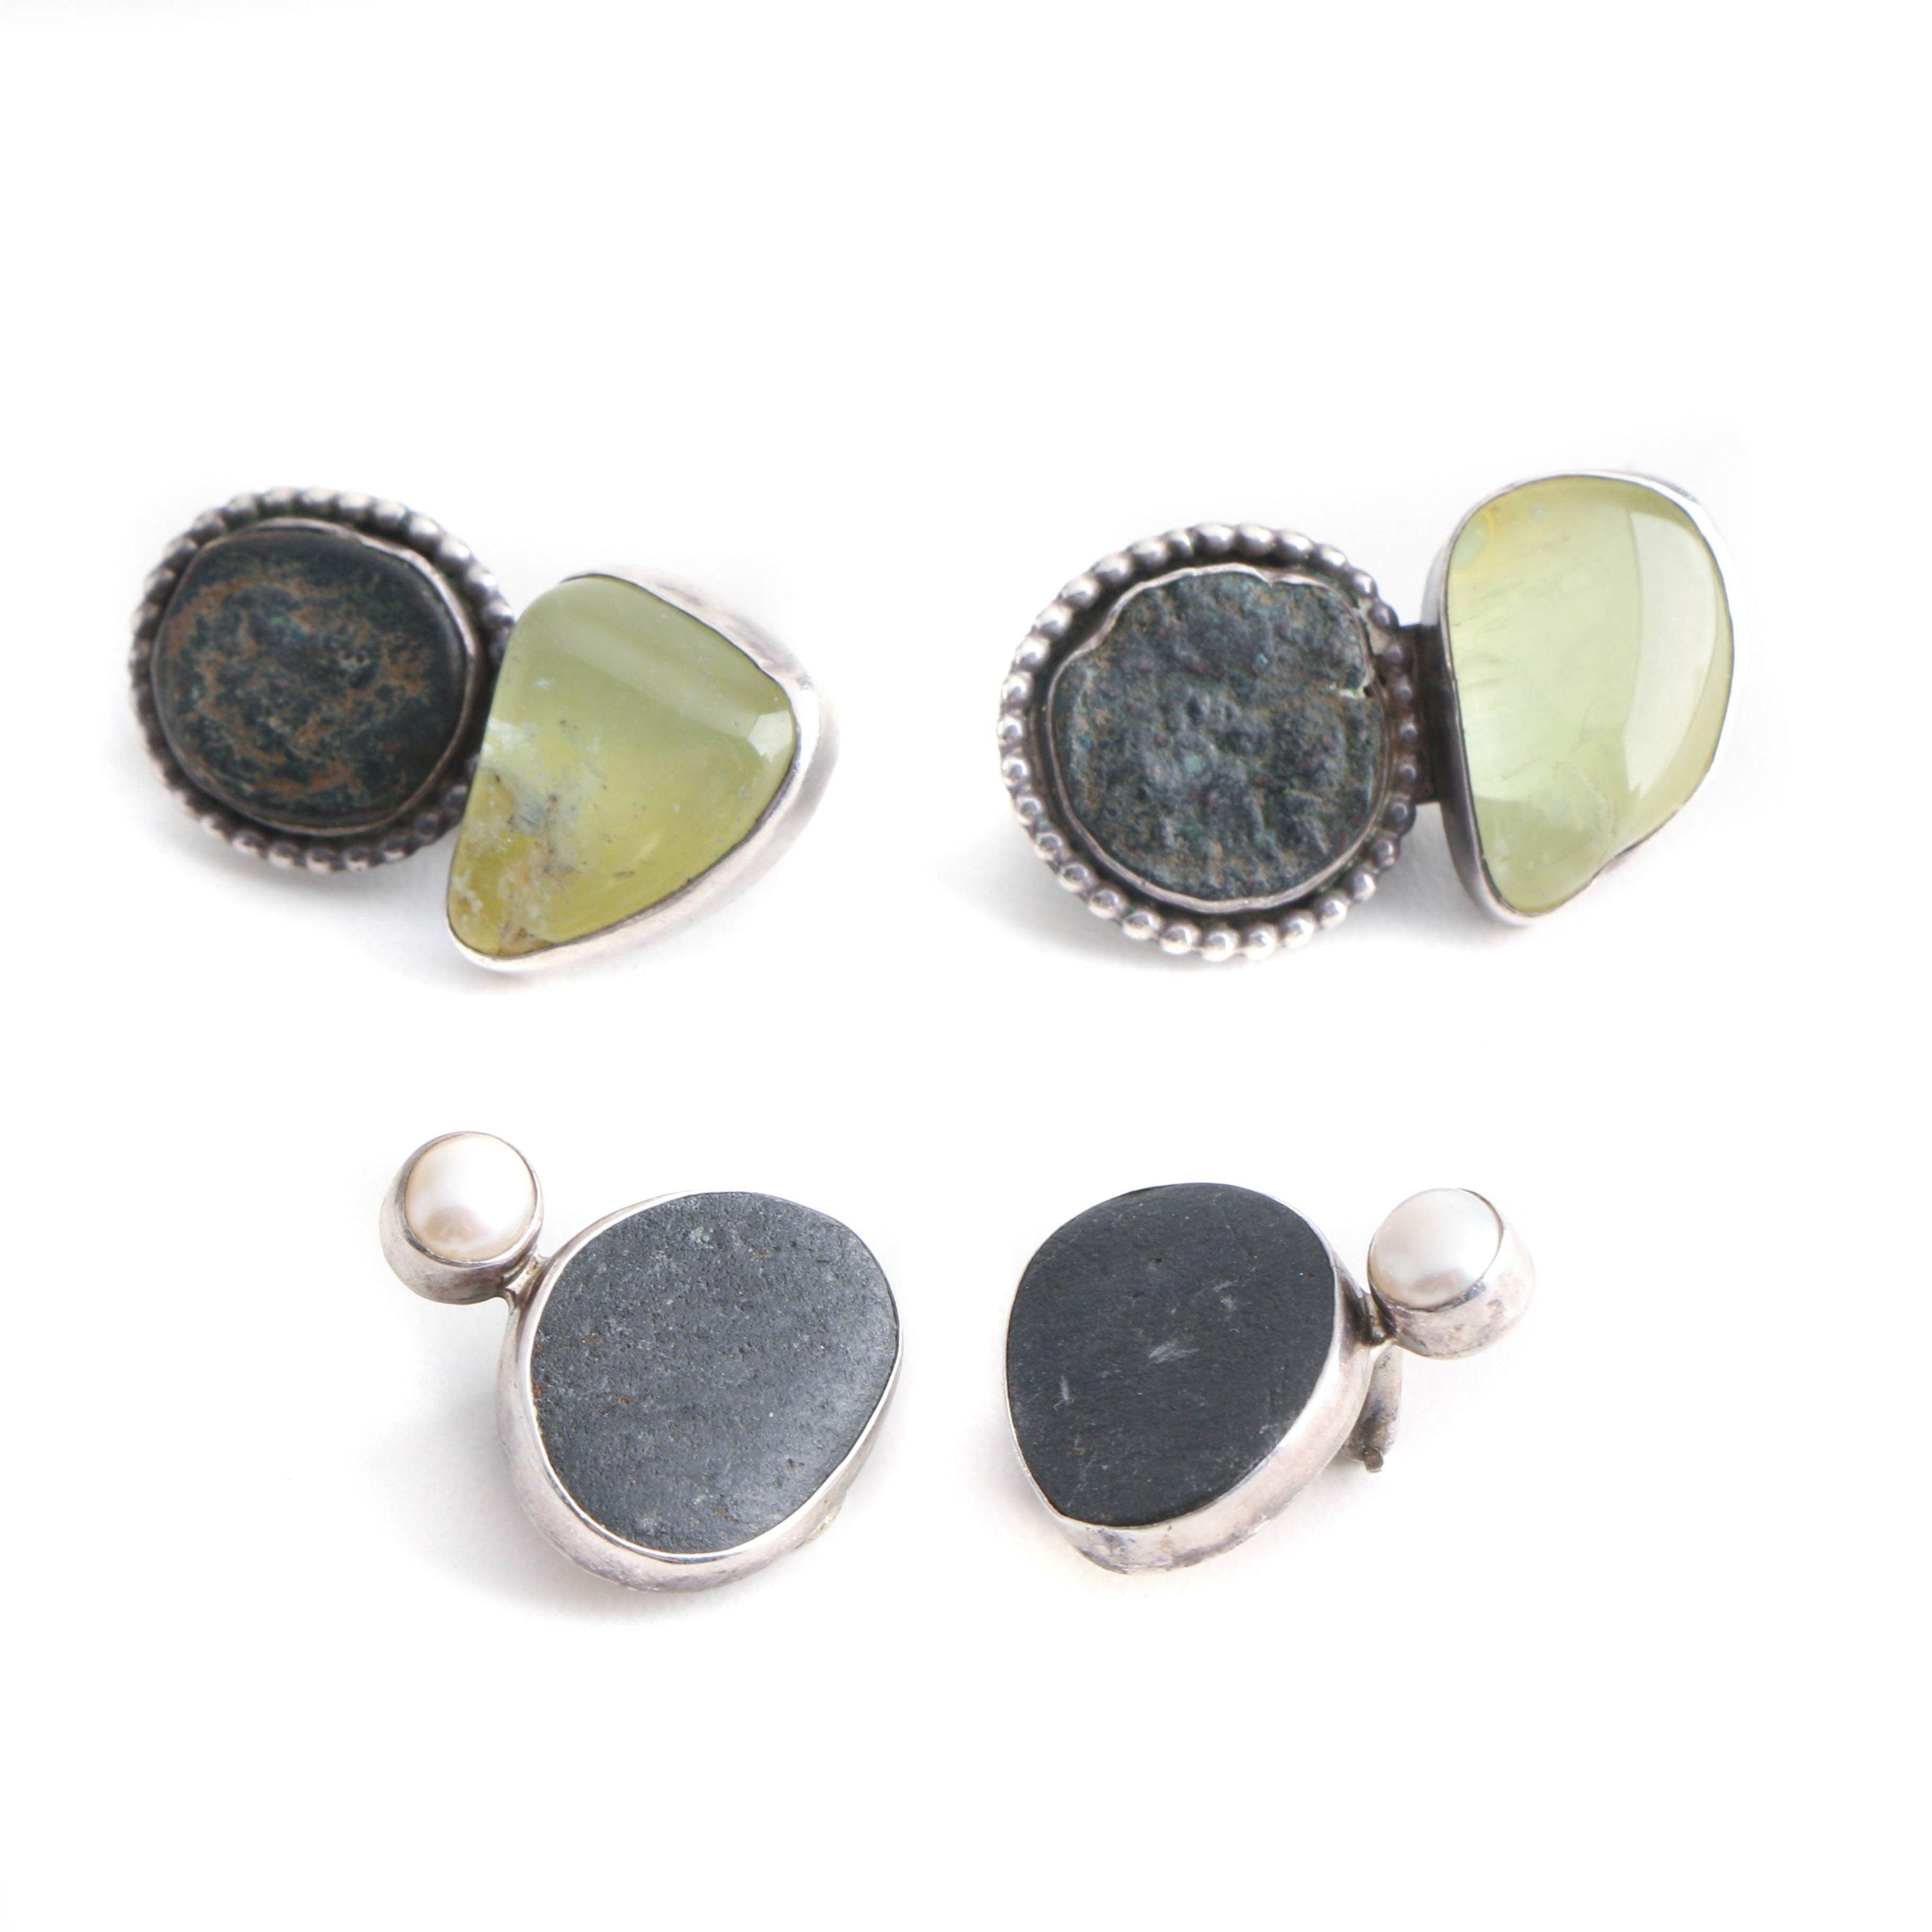 Signed Sterling Silver Earrings Including Gemstones